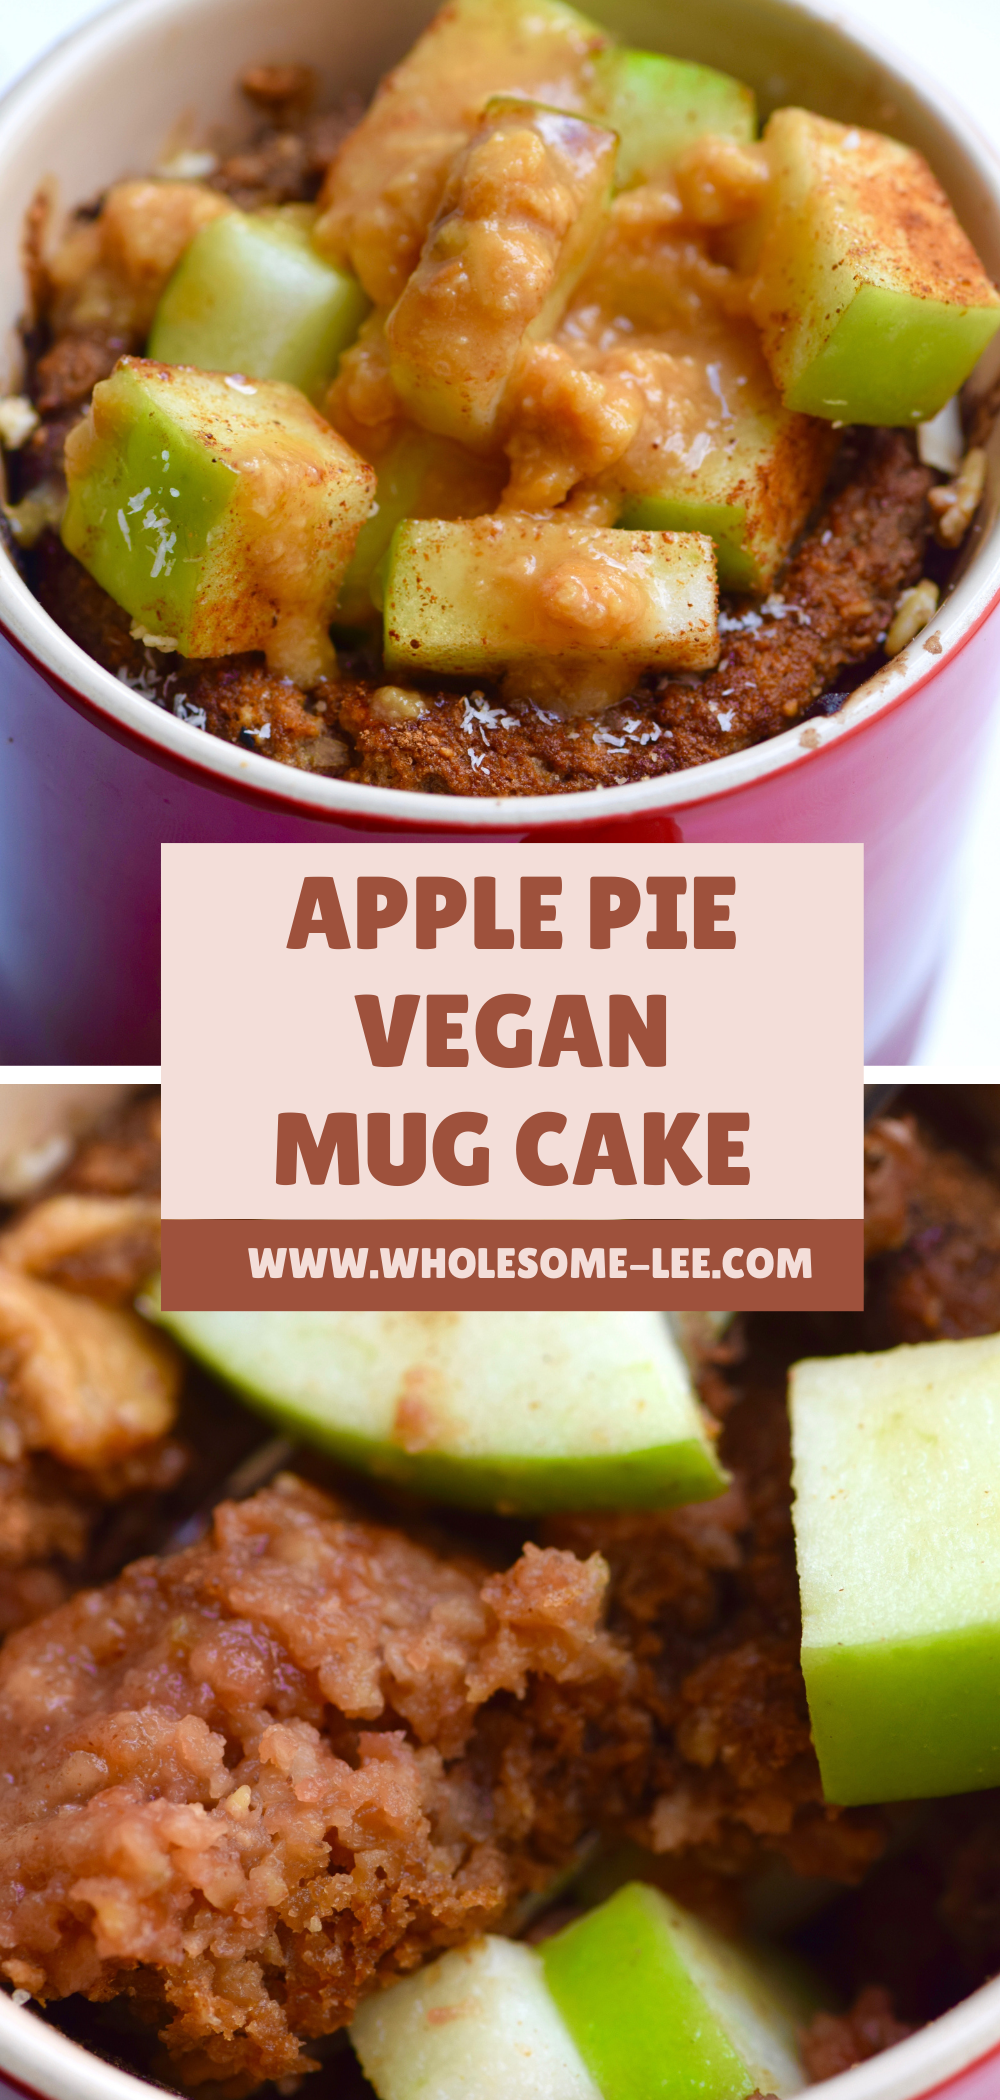 Apple pie vegan mug cake topped with apples and caramel sauce